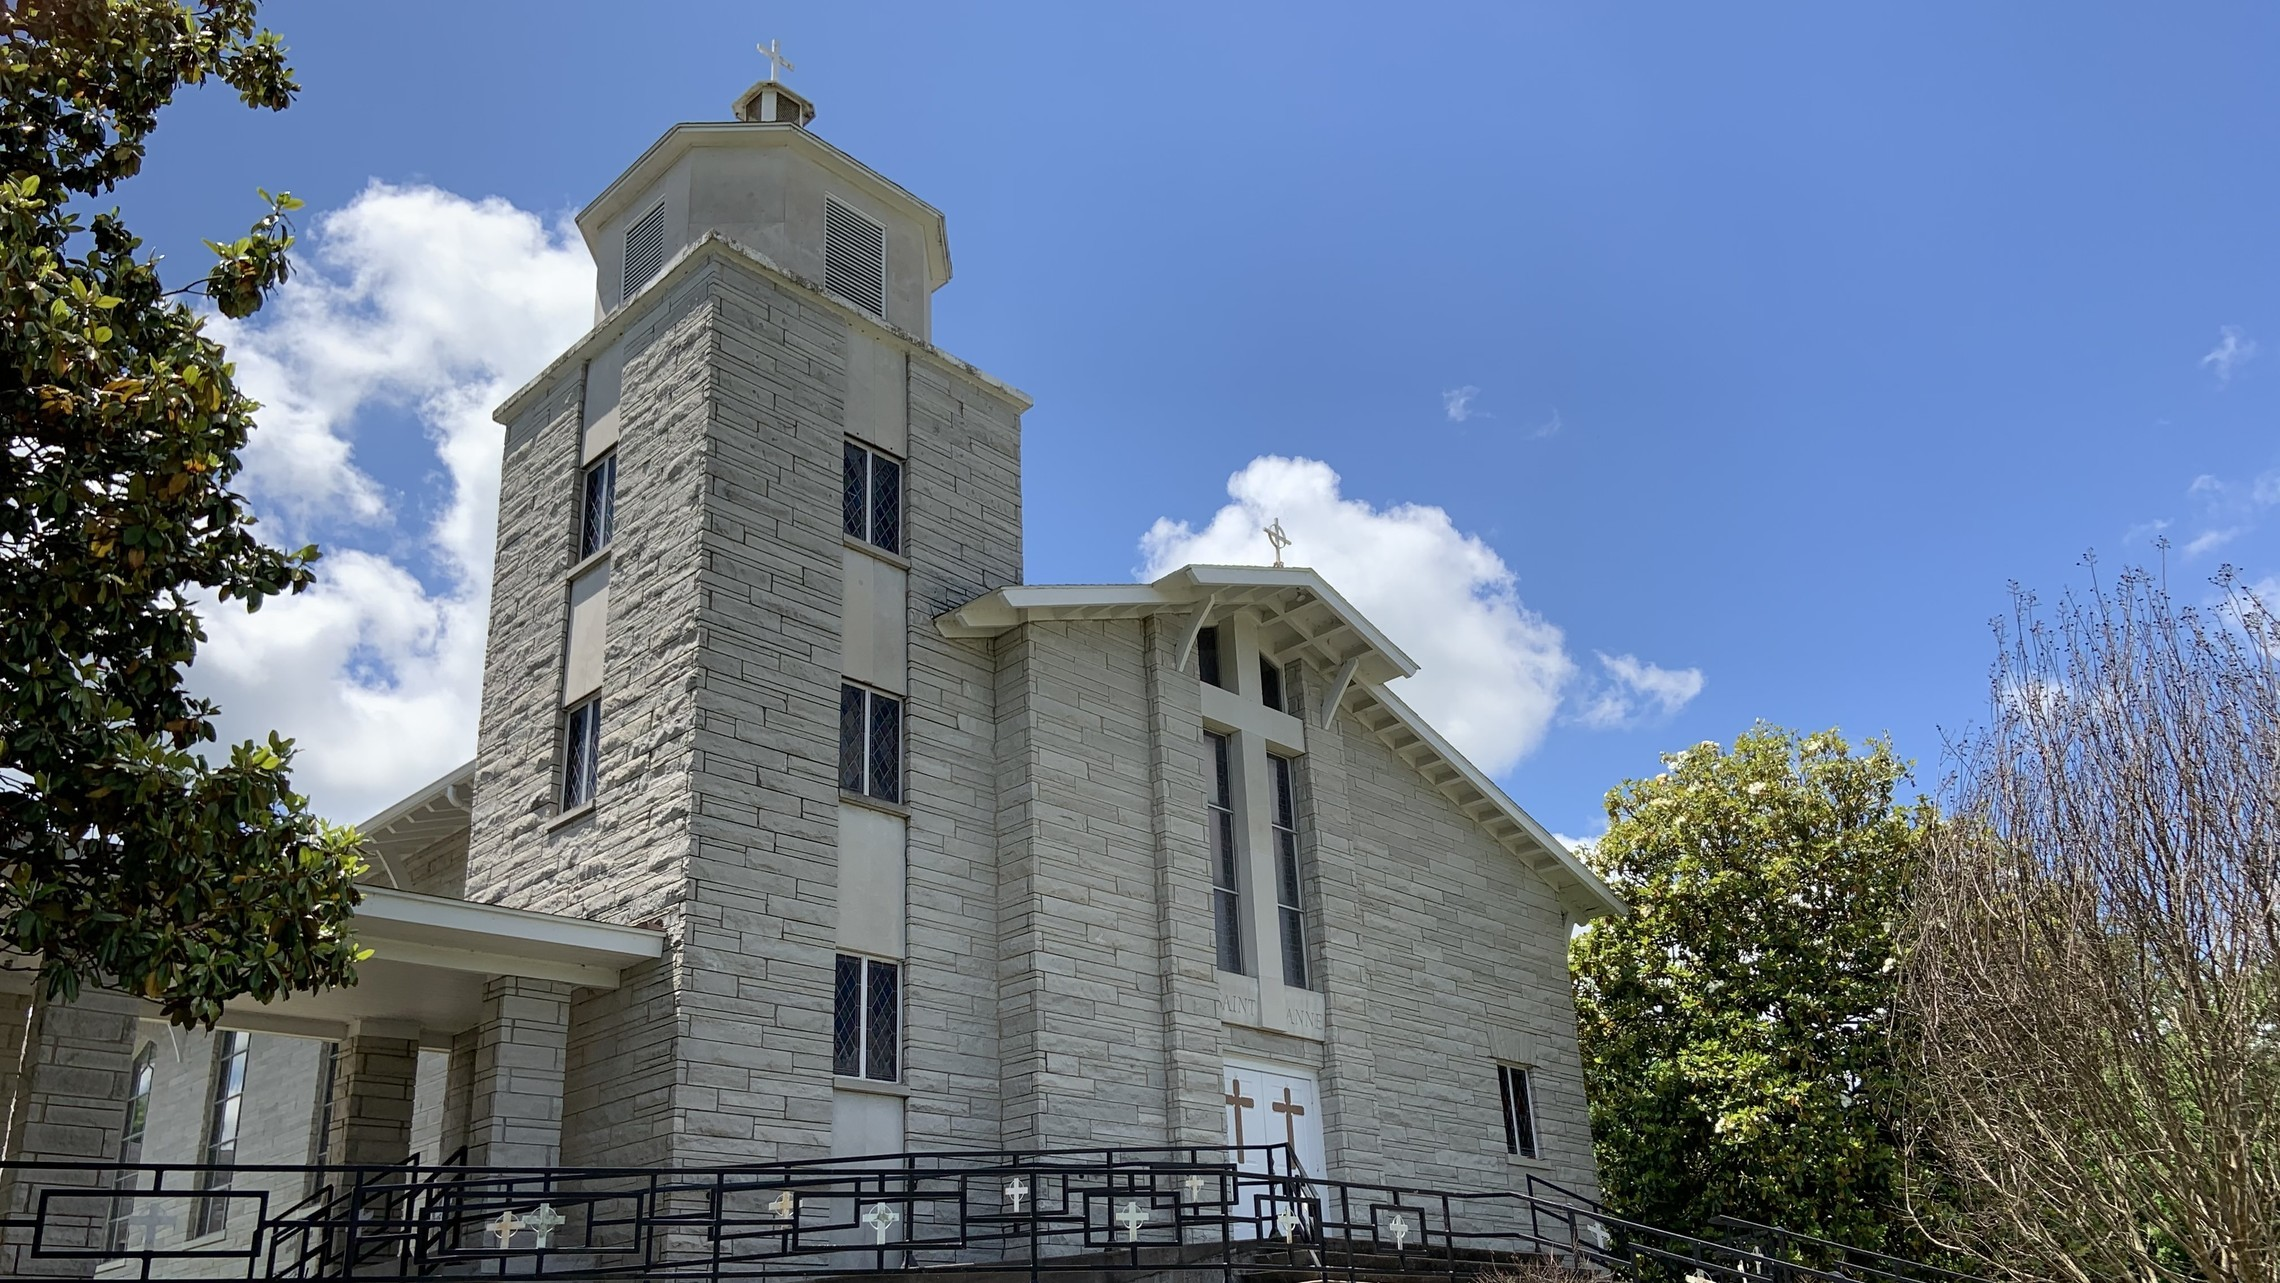 Left Angle of Church